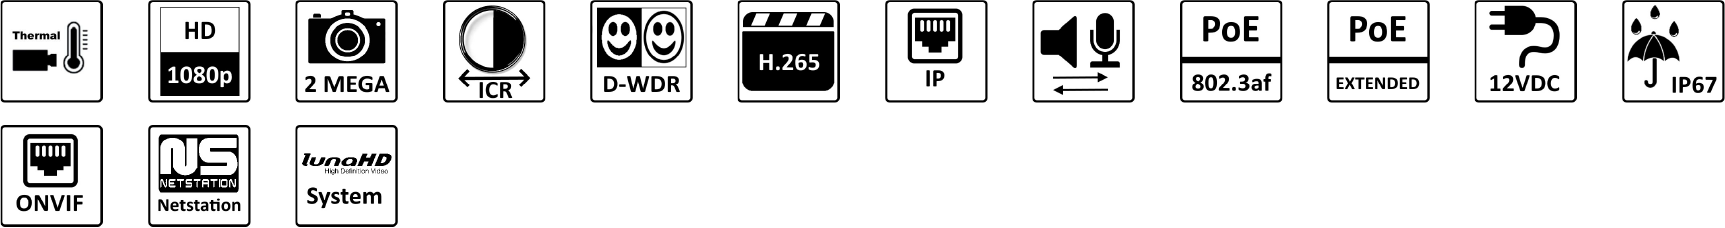 lunaIP_KT-5200-T_Icon